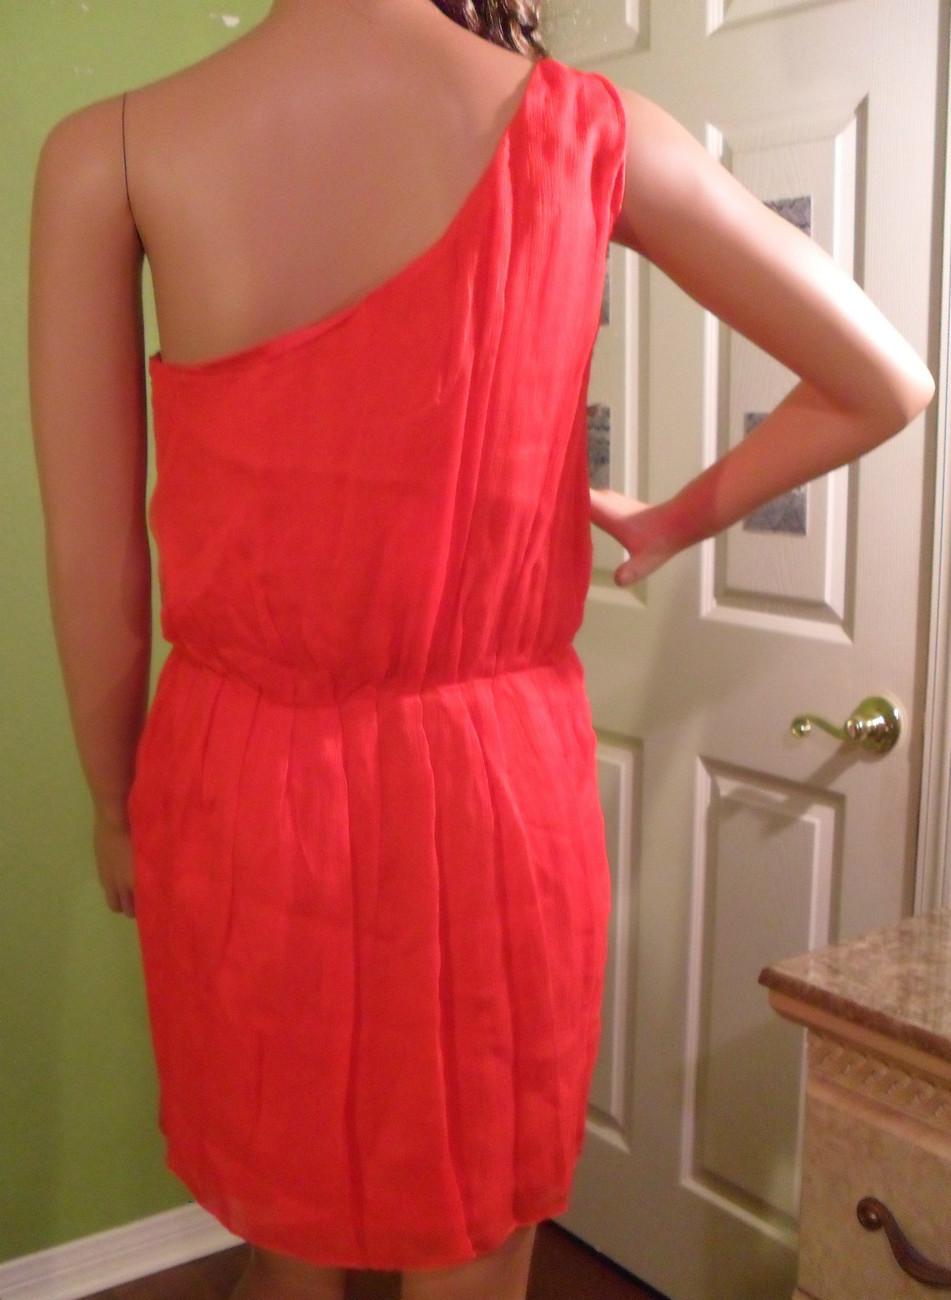 NWT HALSTON HERITAGE Lipstick Red Silk Pleated Dress Sz 6 NEW (MAKE AN OFFER)